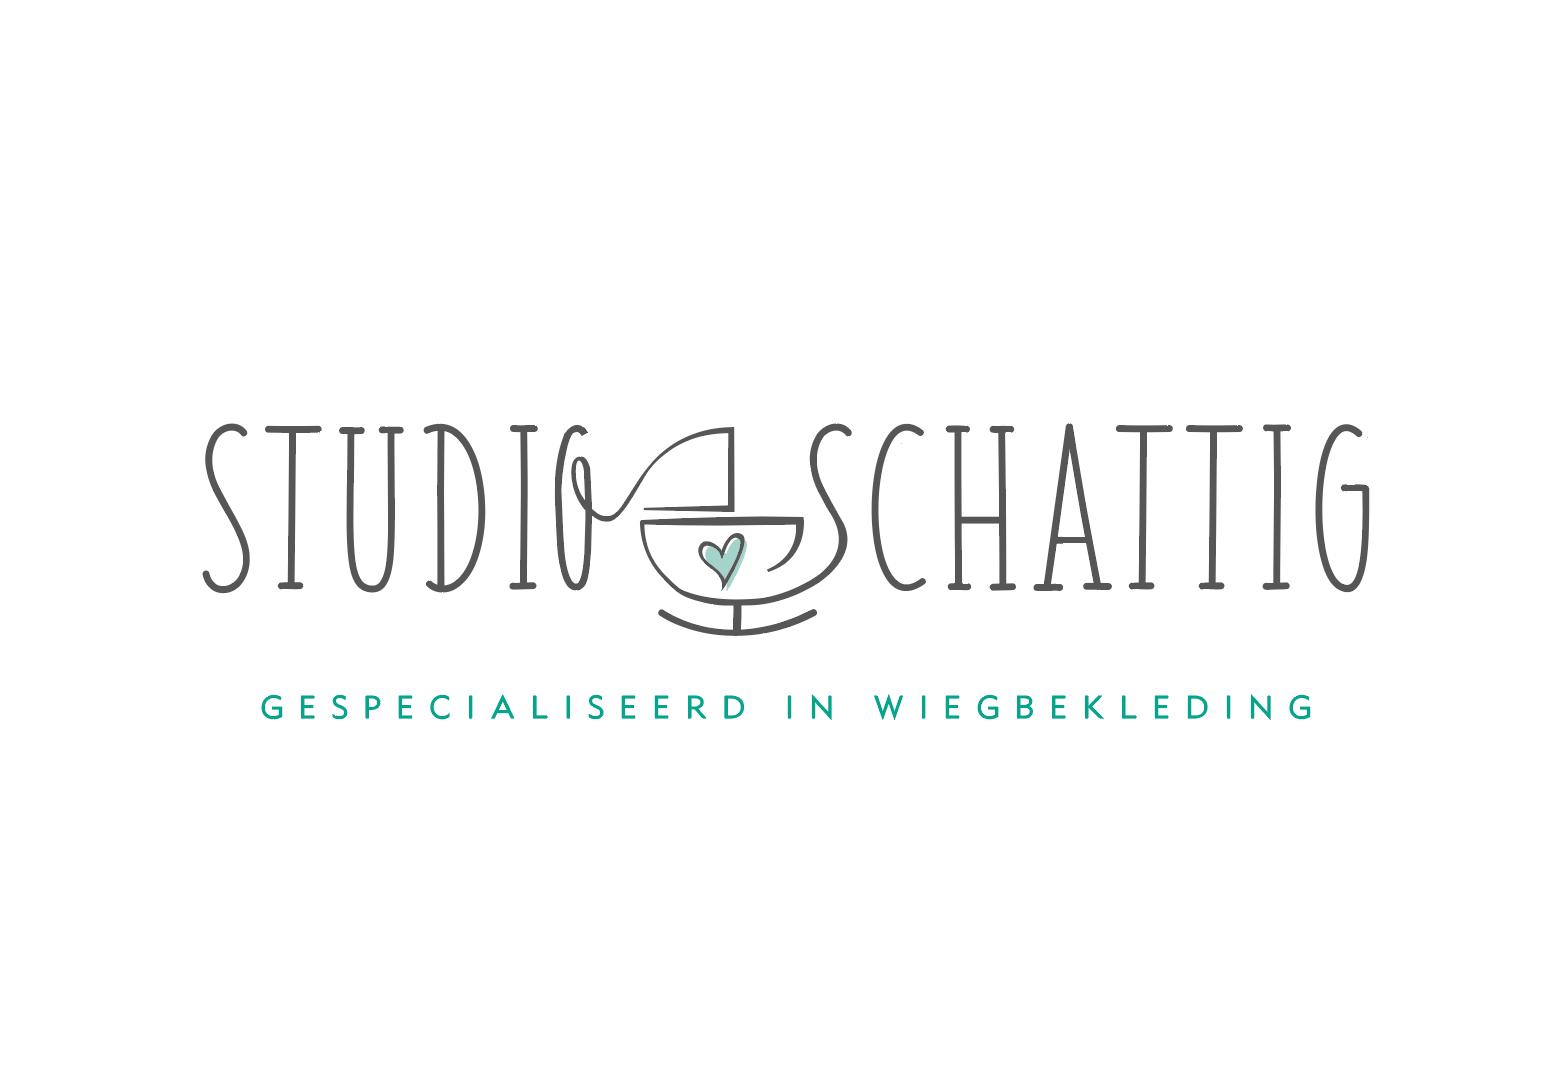 STUDIO SCHATTIG